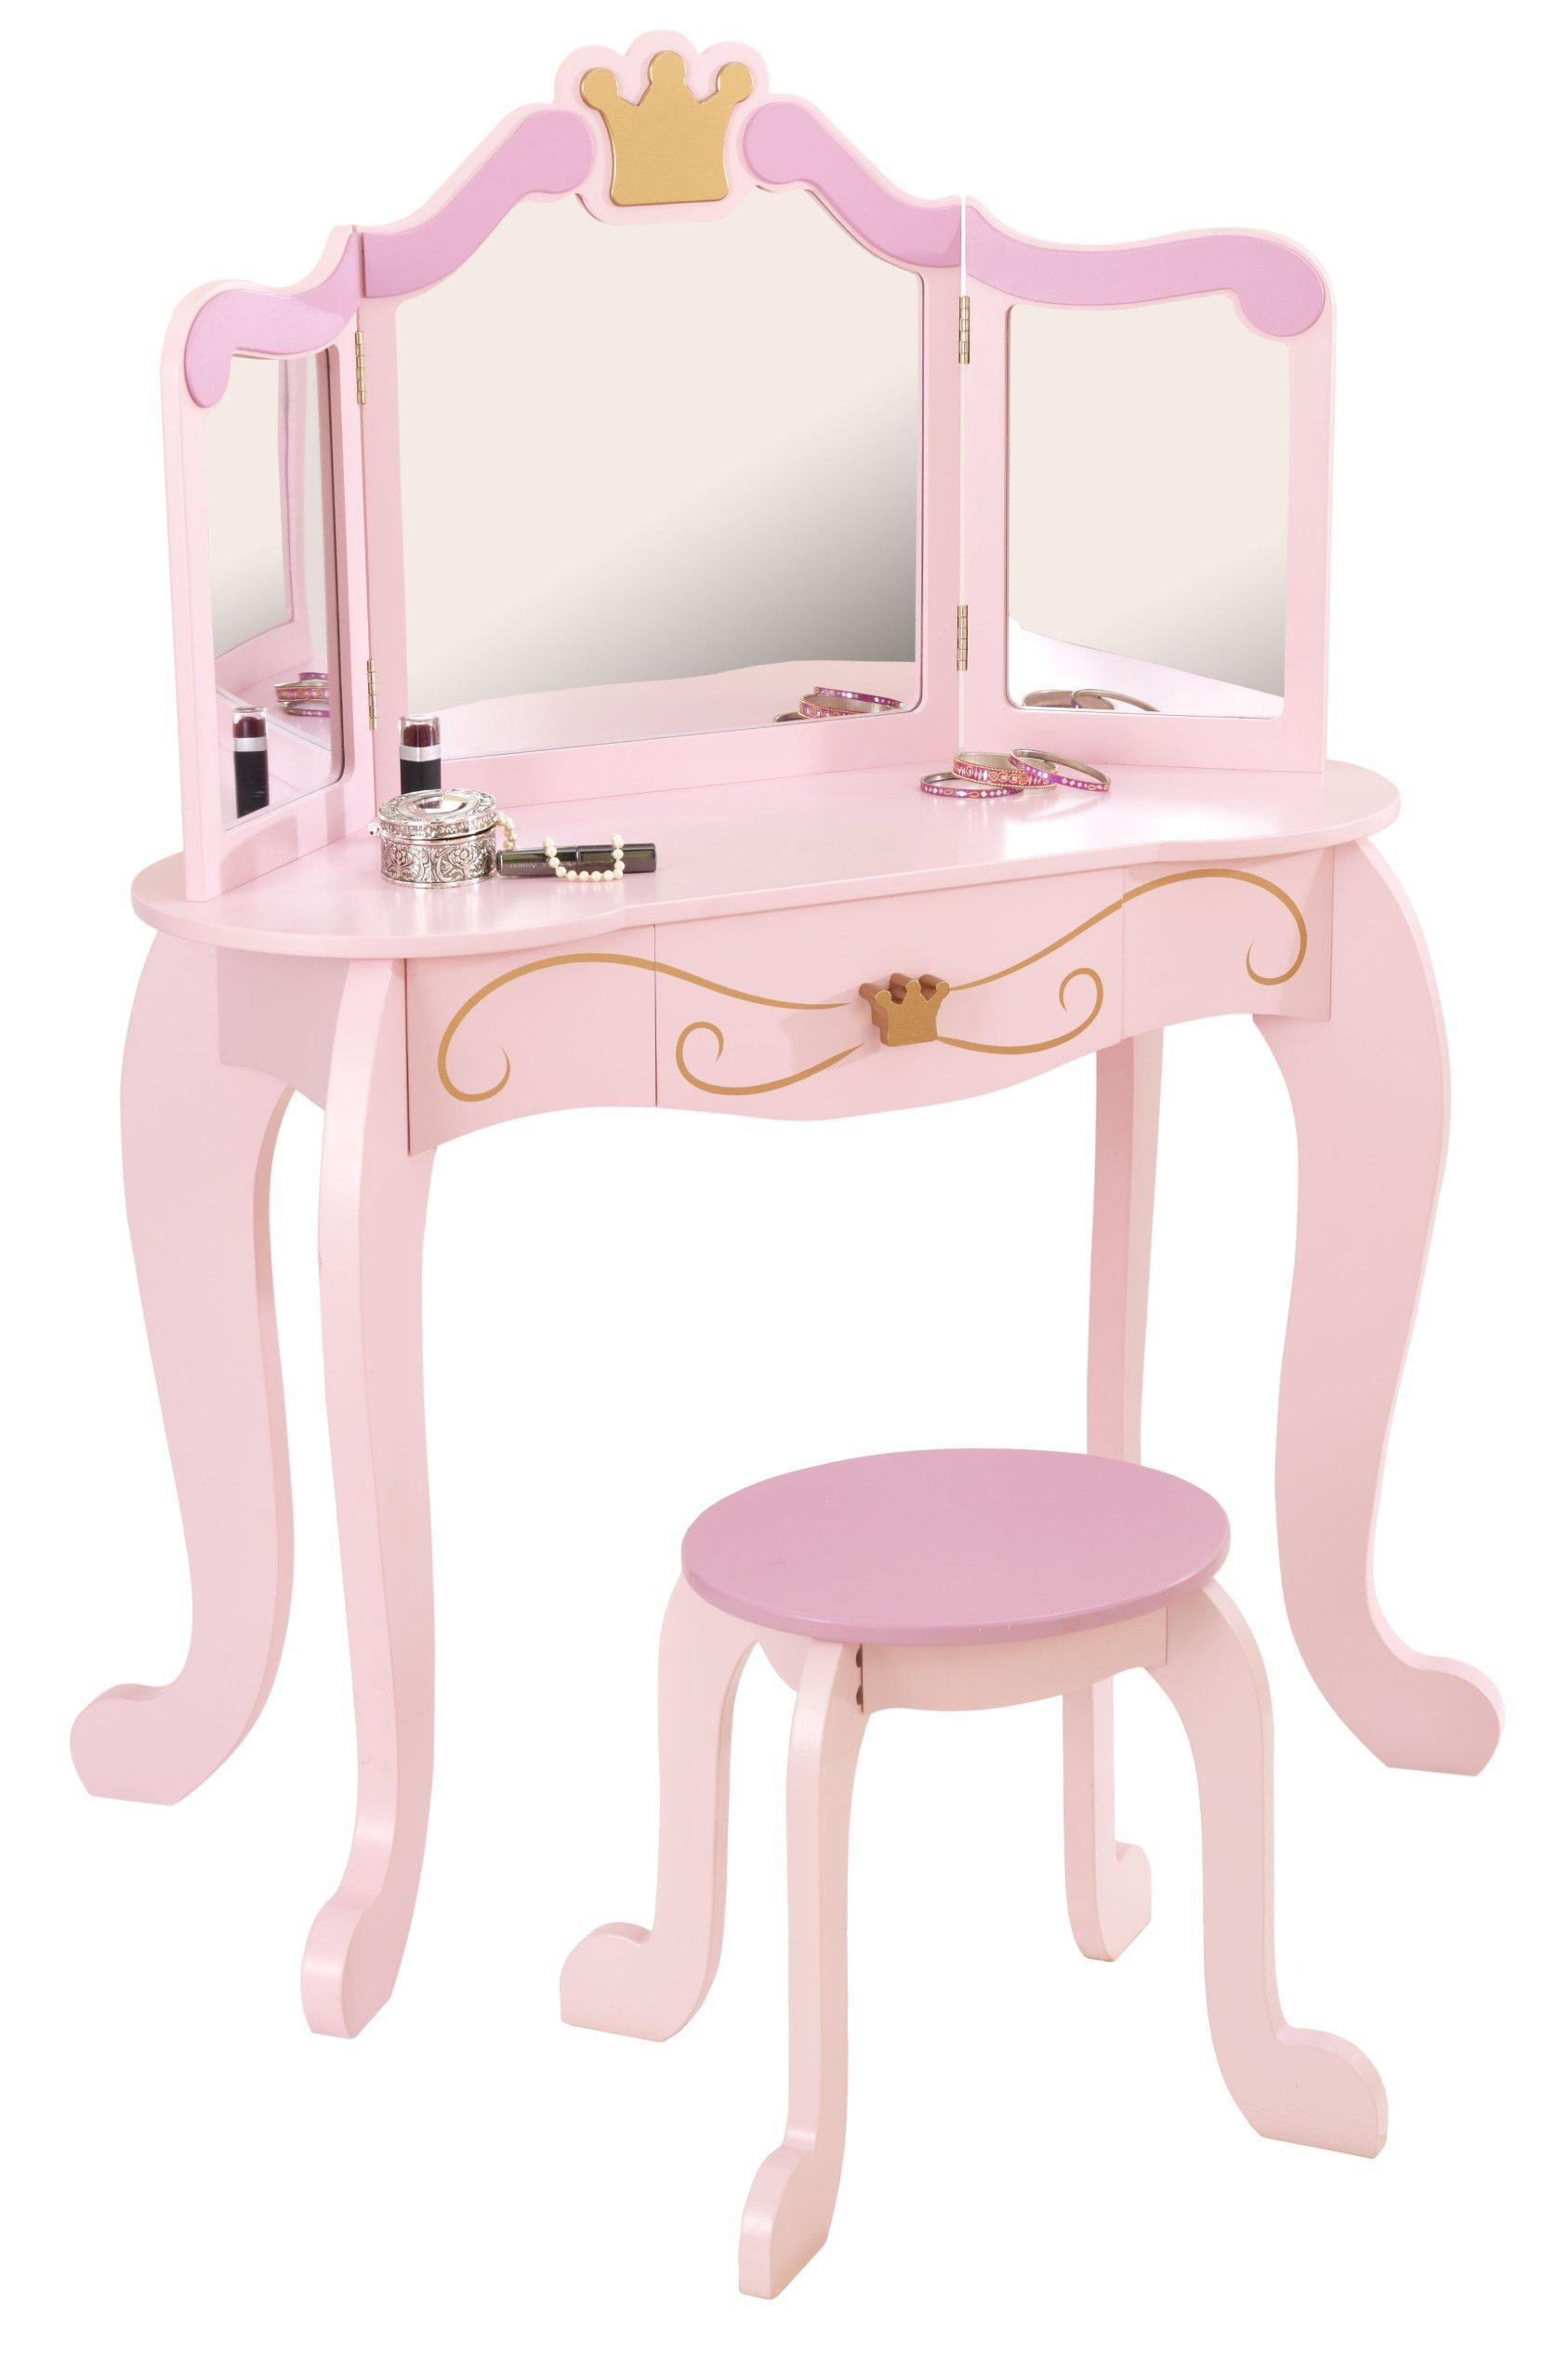 KidKraft Princess Table & Stool by KidKraft